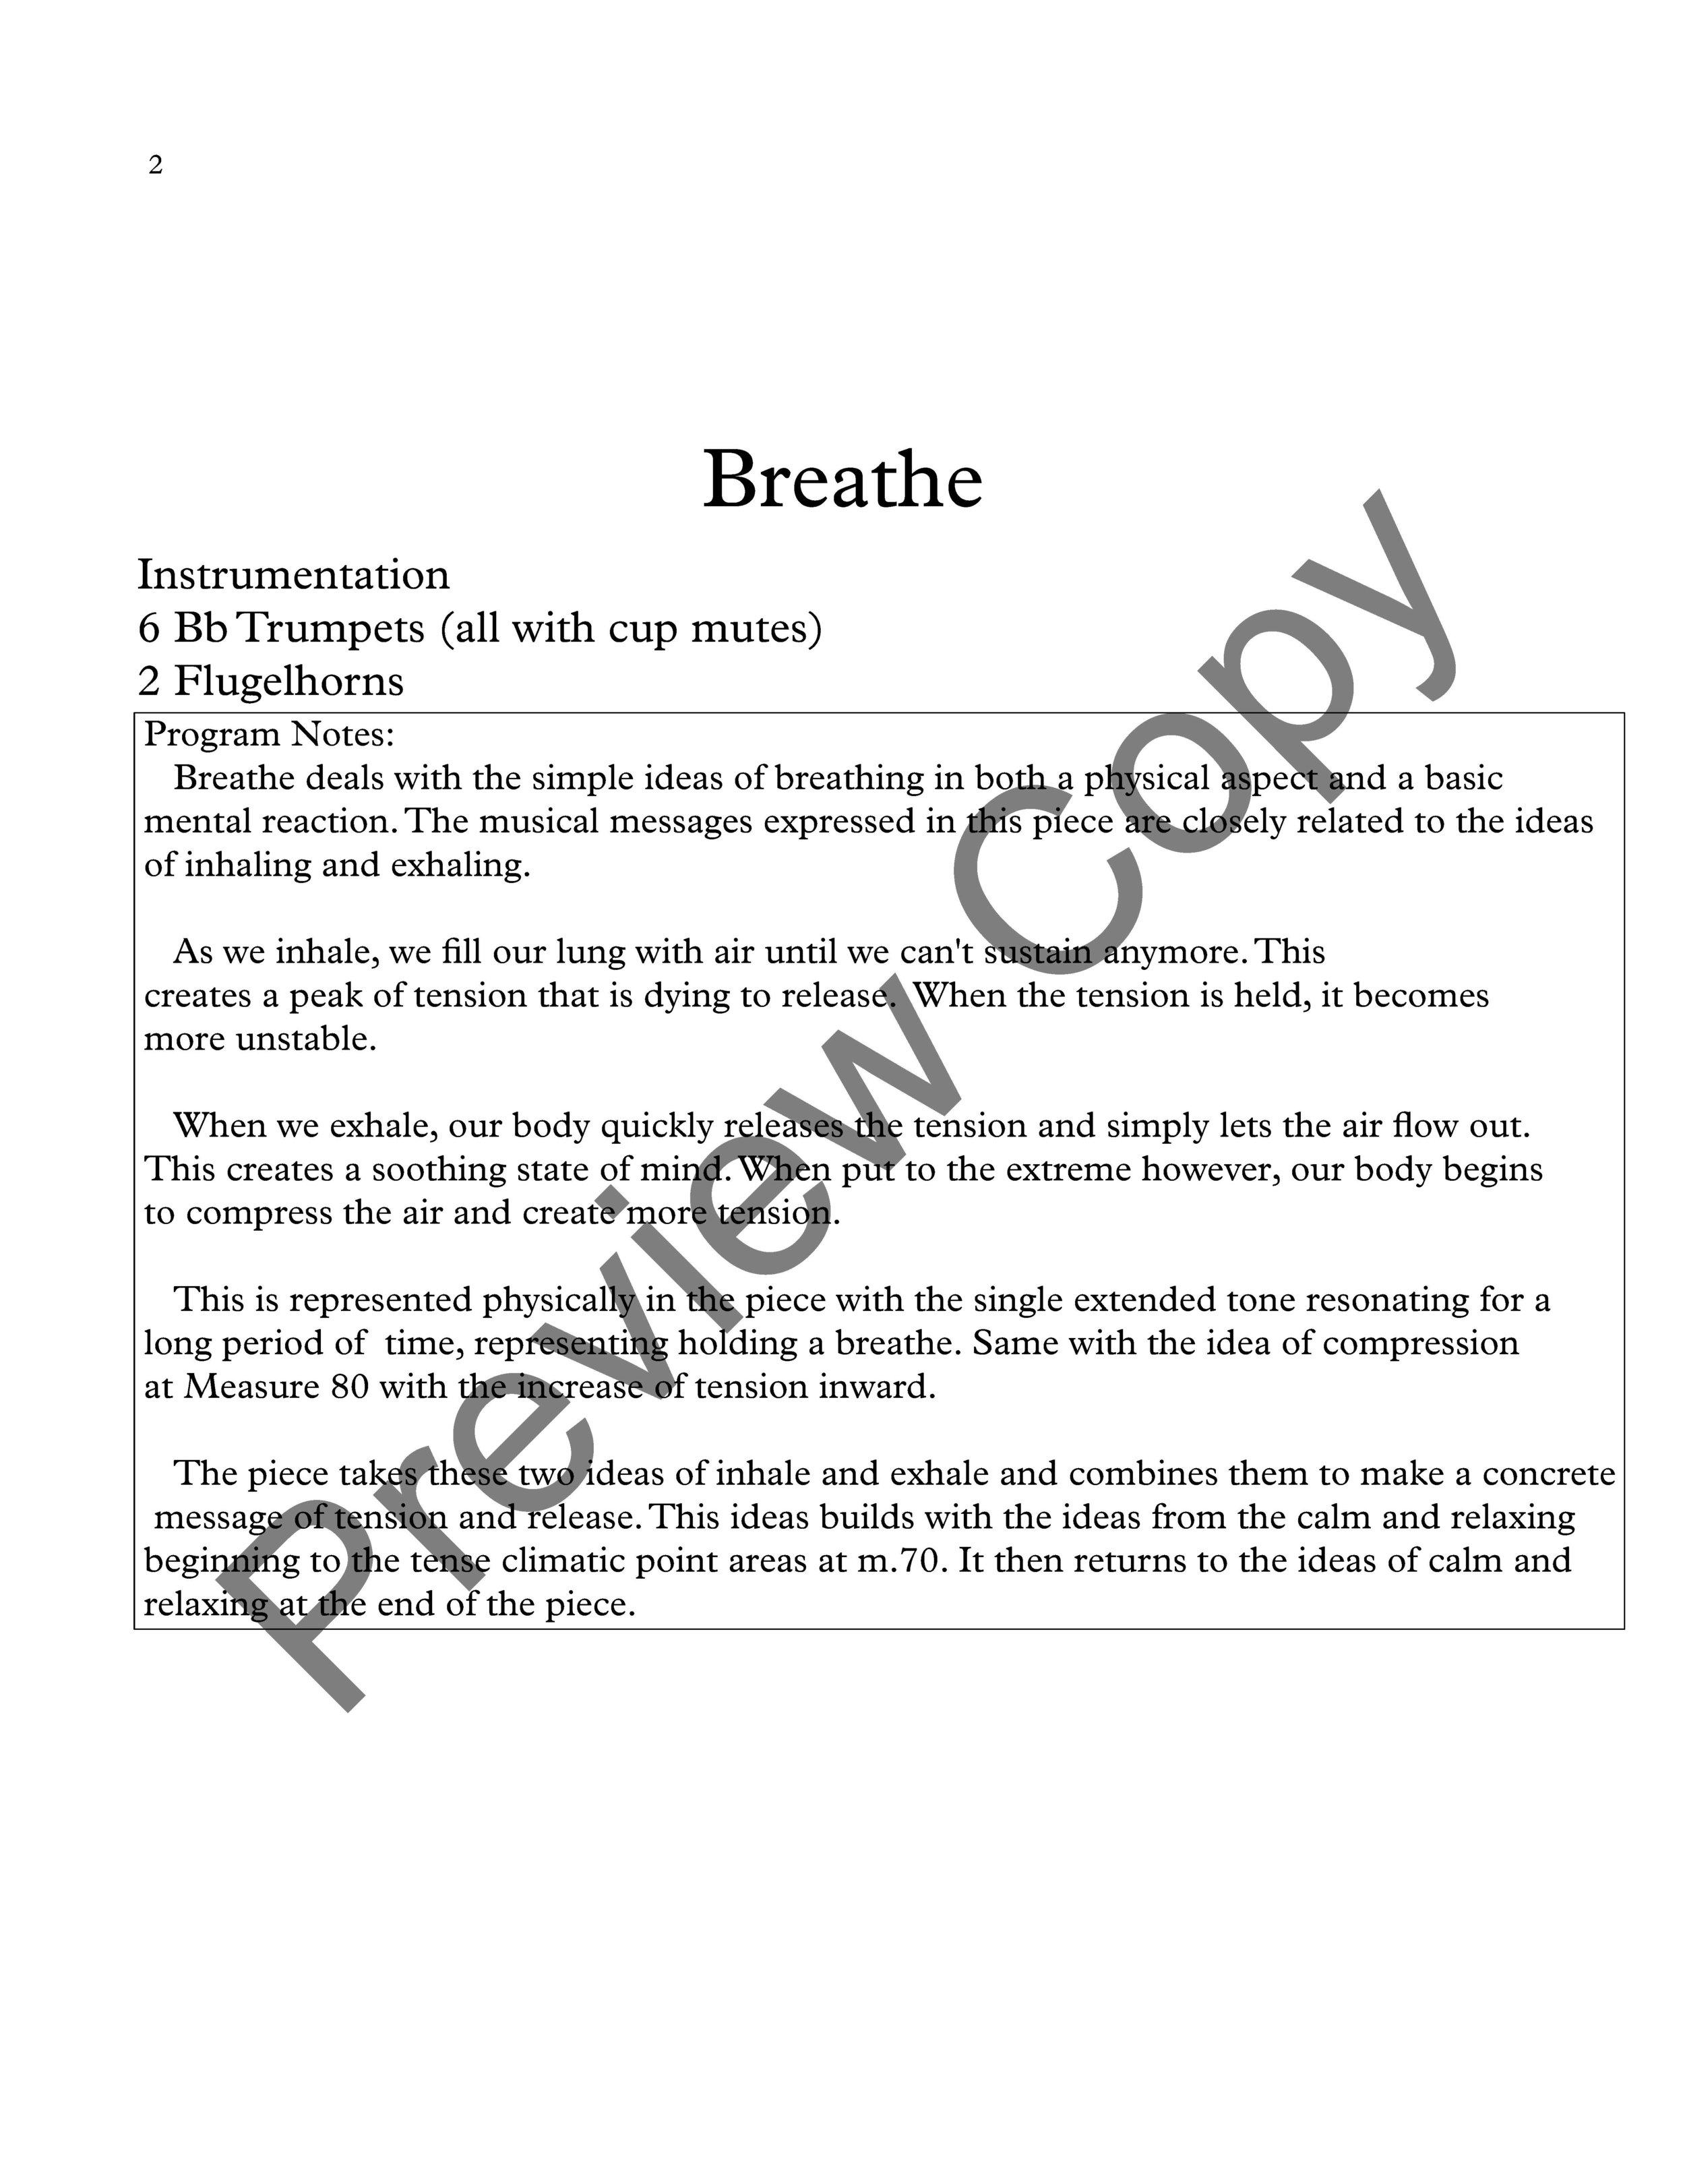 Breathe (Final) - _Page_02.jpg